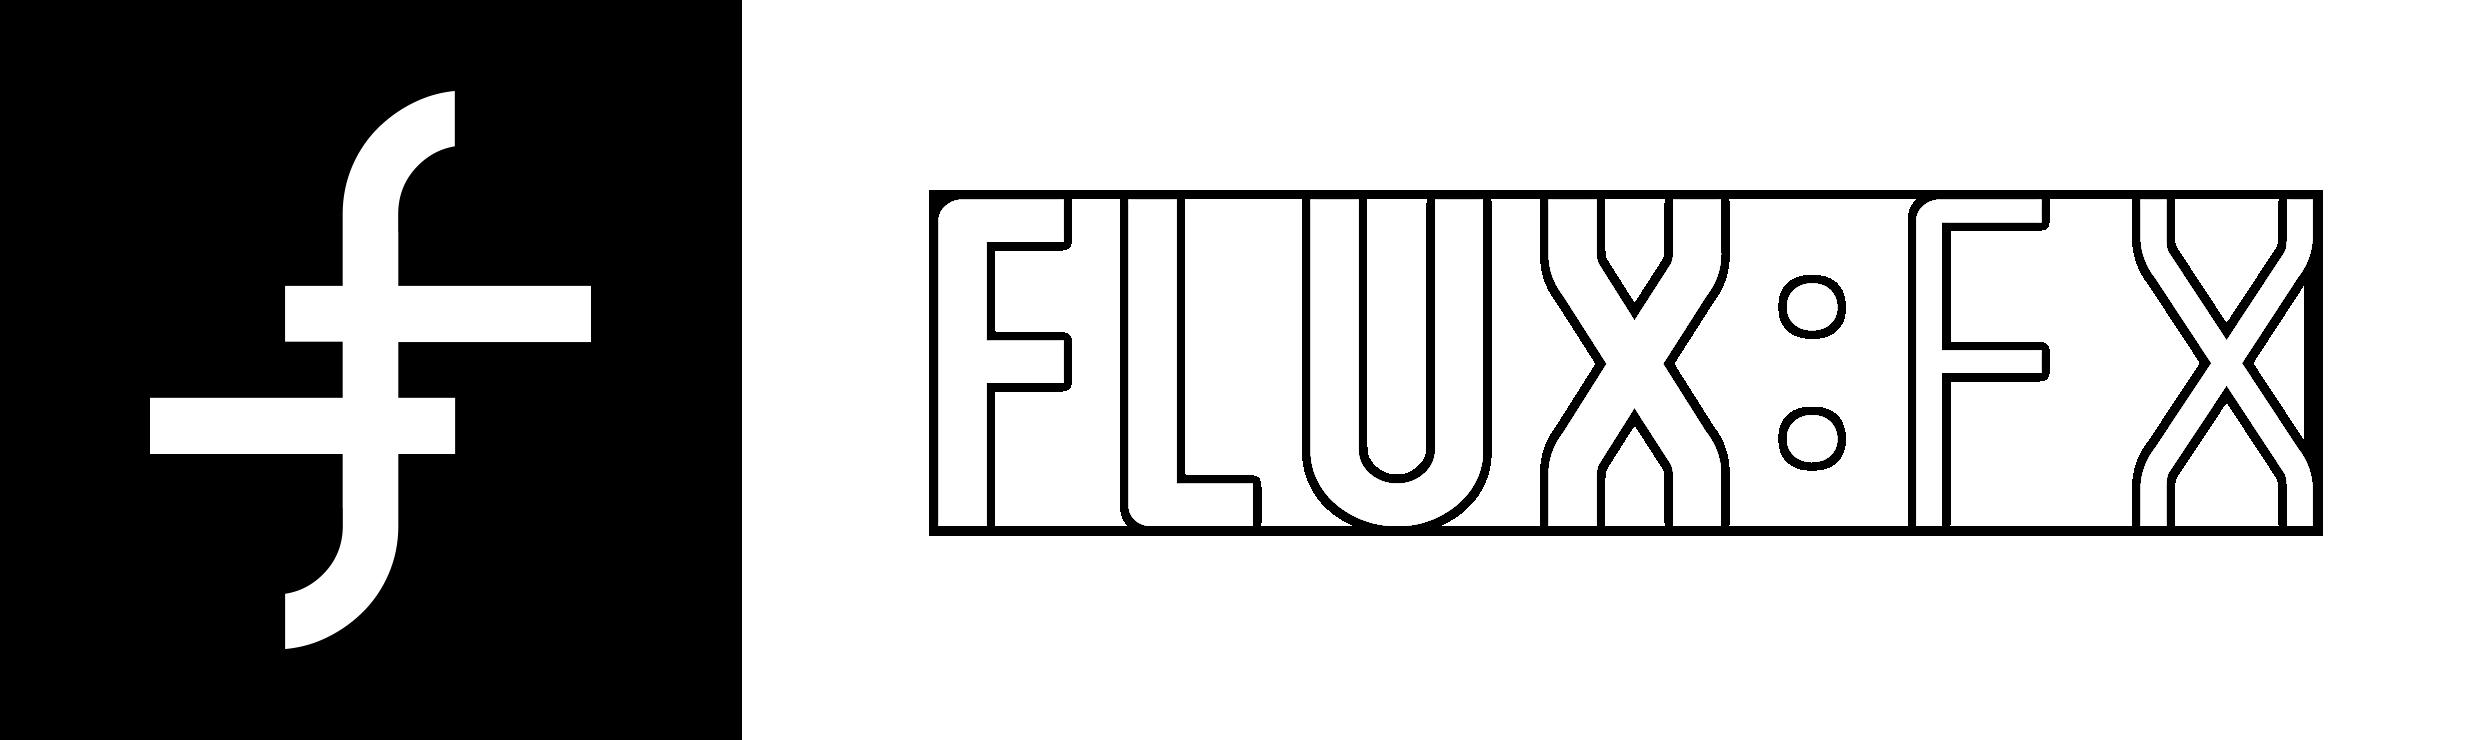 FLUX_FX_header1